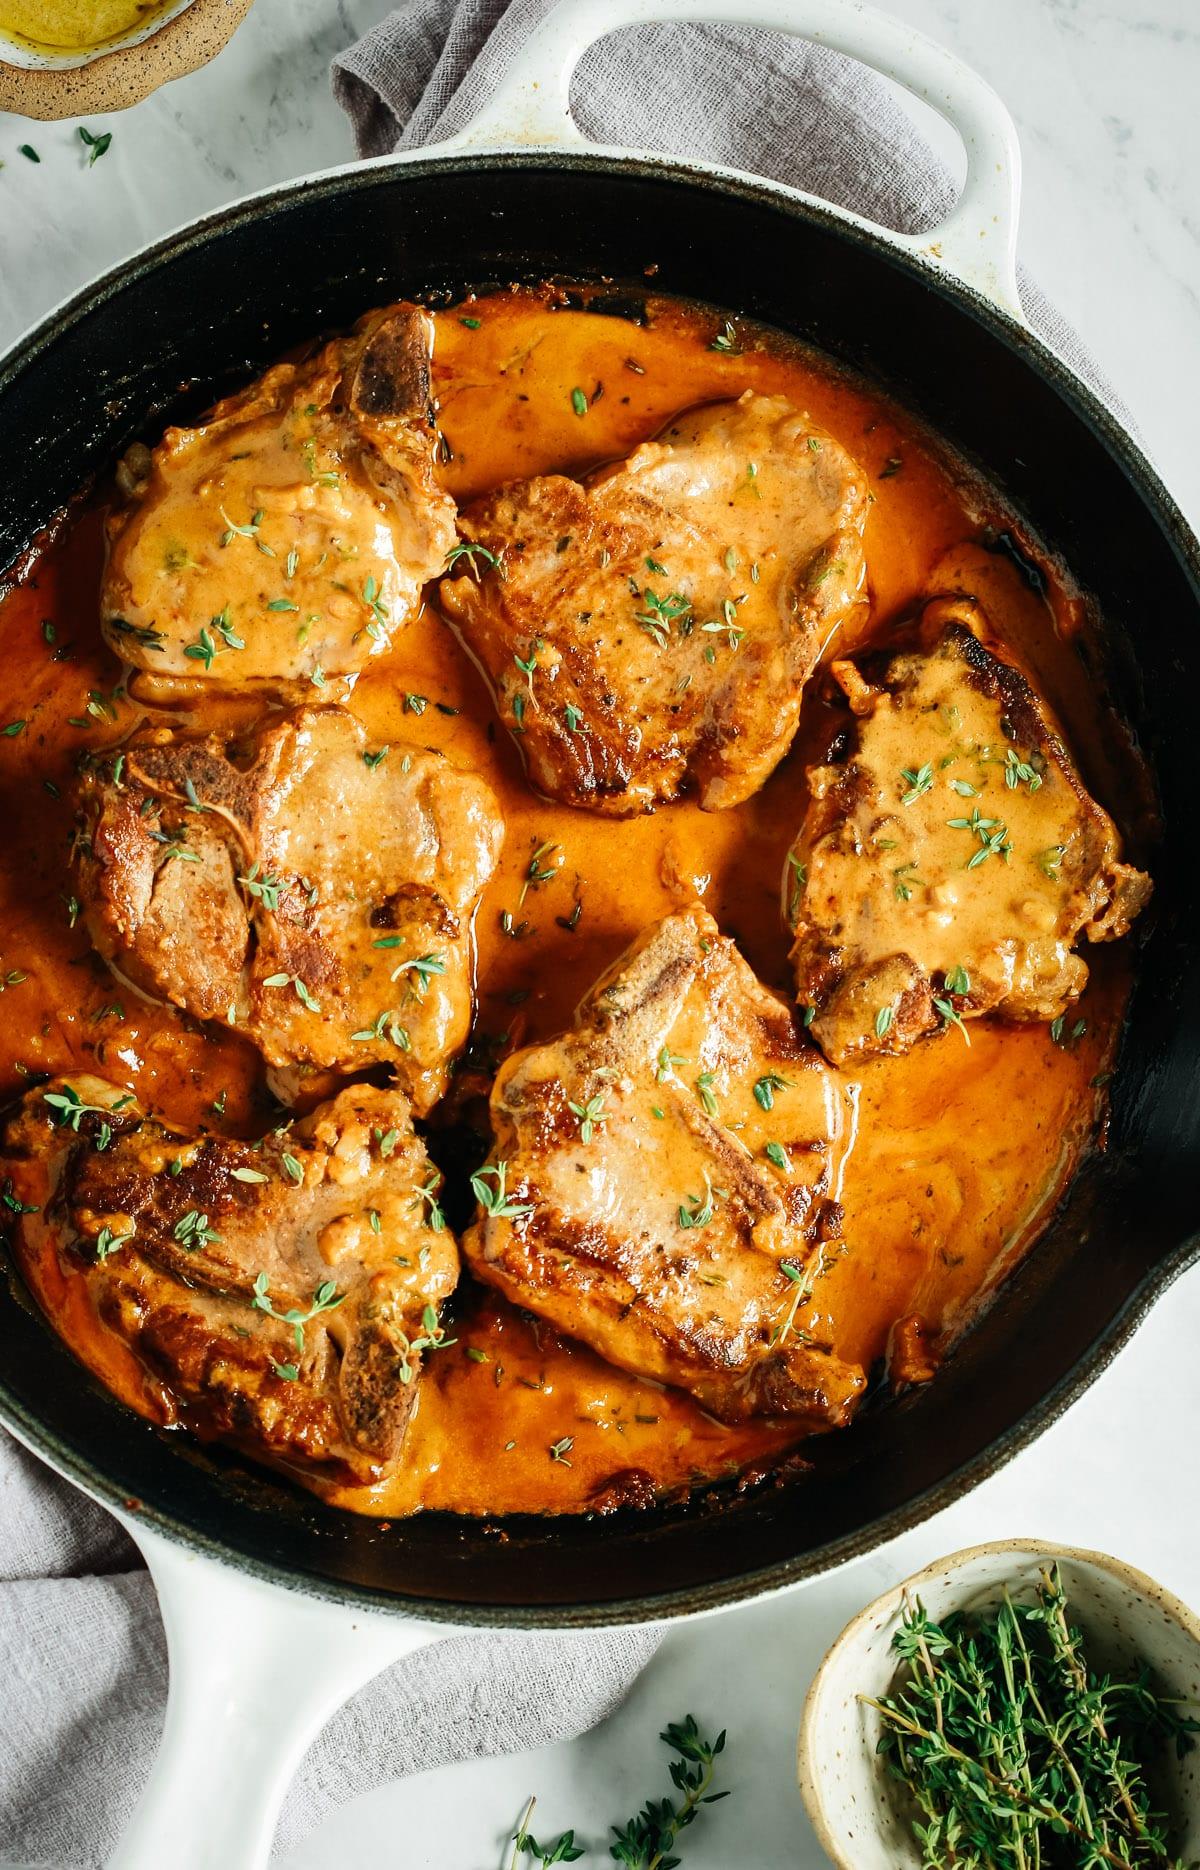 lamb sirloin chops cooking in pan